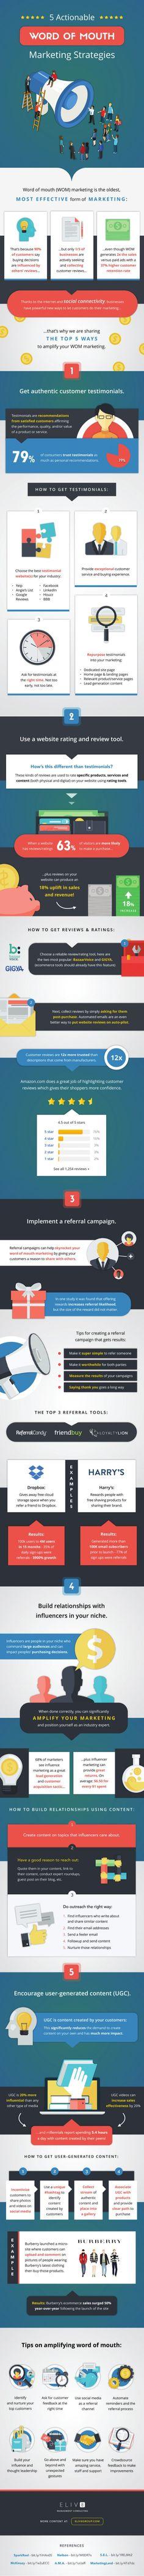 5 Actionable Word of Mouth Marketing Strategies #brandmarketing #growthhacking